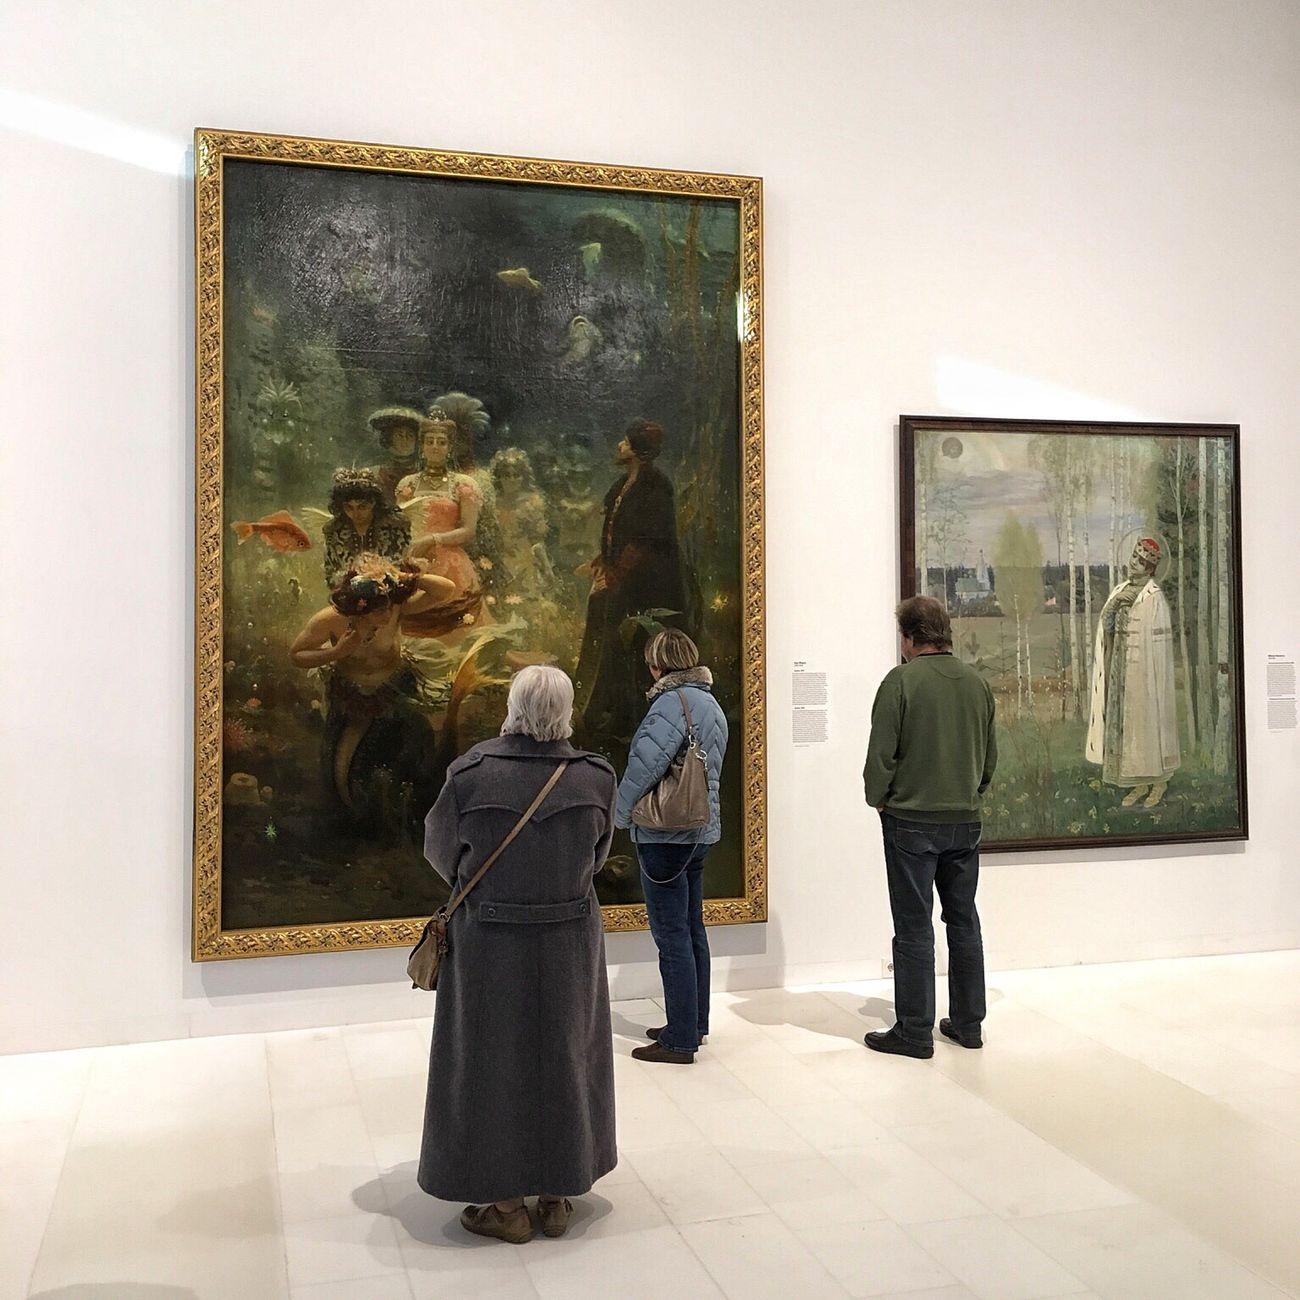 Assen Museum Drentsmuseum Exhibition Painting Arts Culture And Entertainment Indoors  Rear View